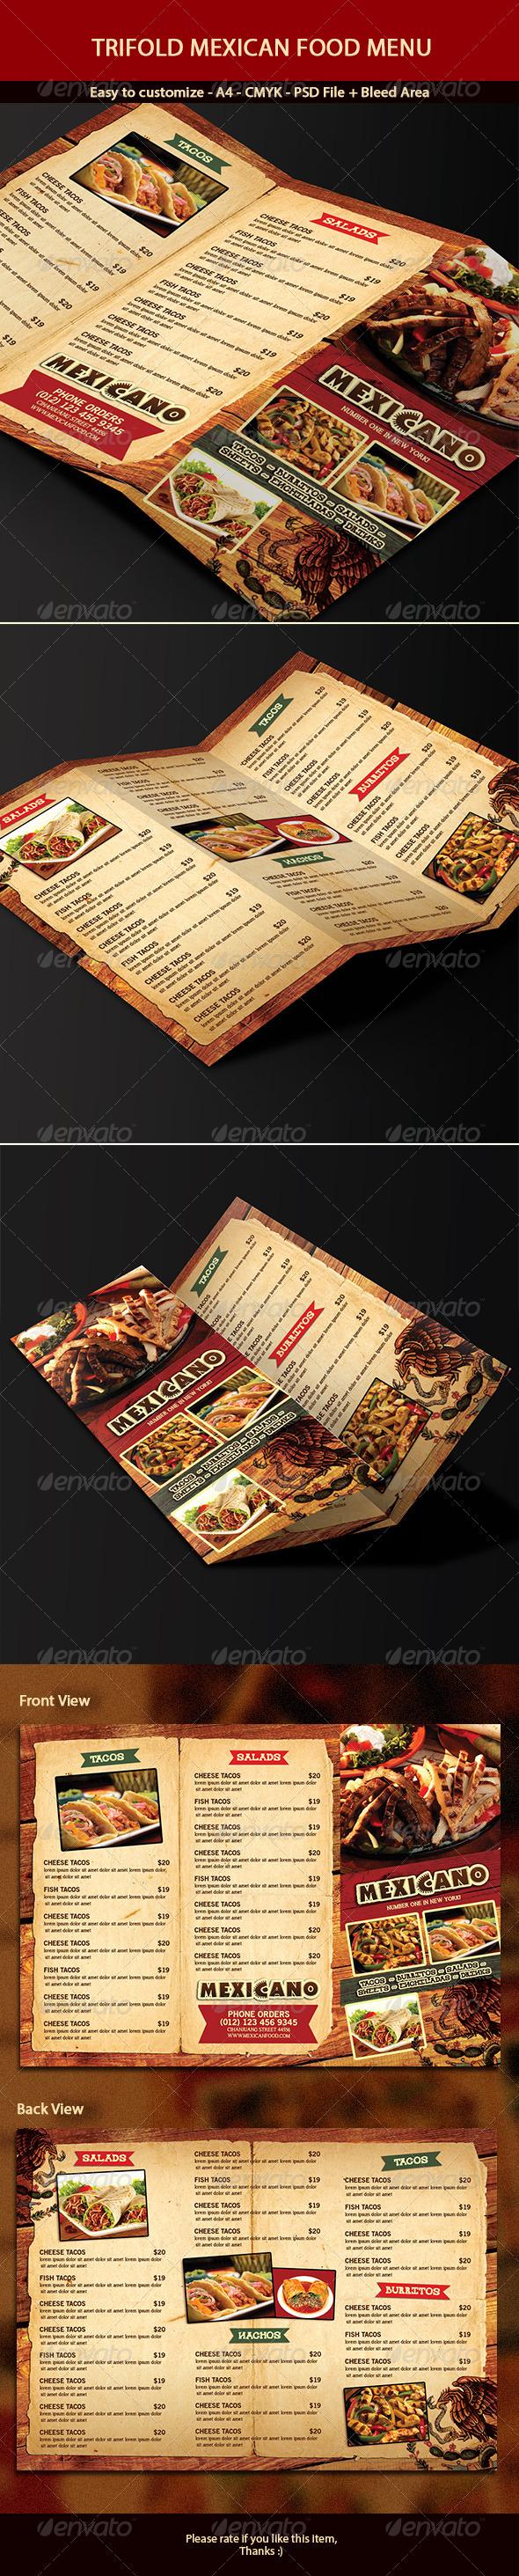 Trifold Mexican Menu - Food Menus Print Templates